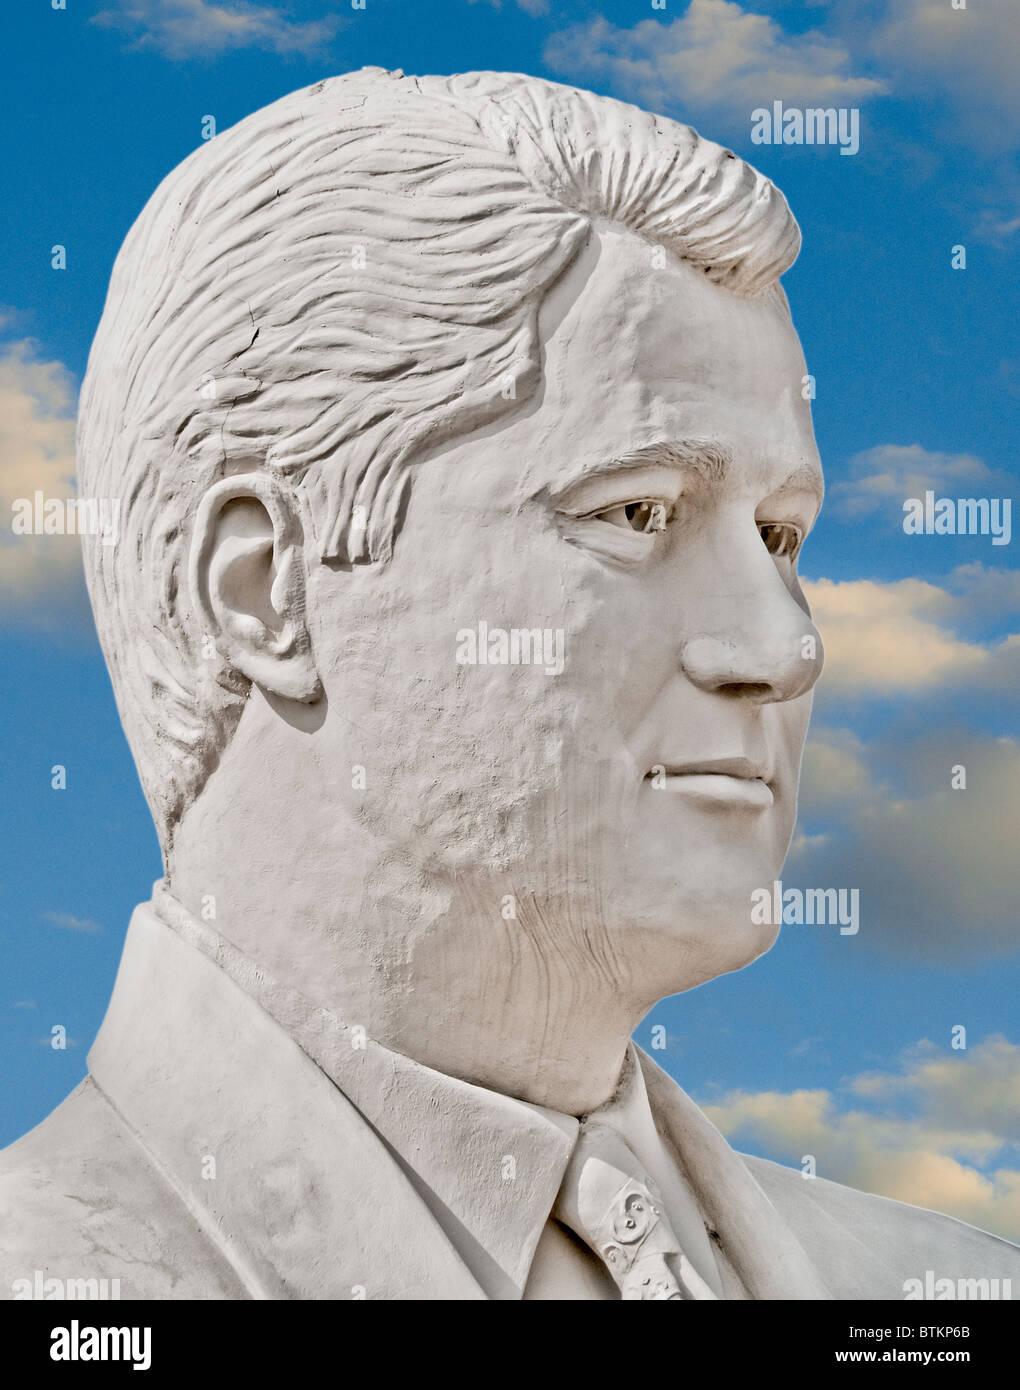 White concrete sculpture of Bill Clinton, 41st US President, at David Adickes Sculpturworx Studio in Houston, Texas, USA Stock Photo